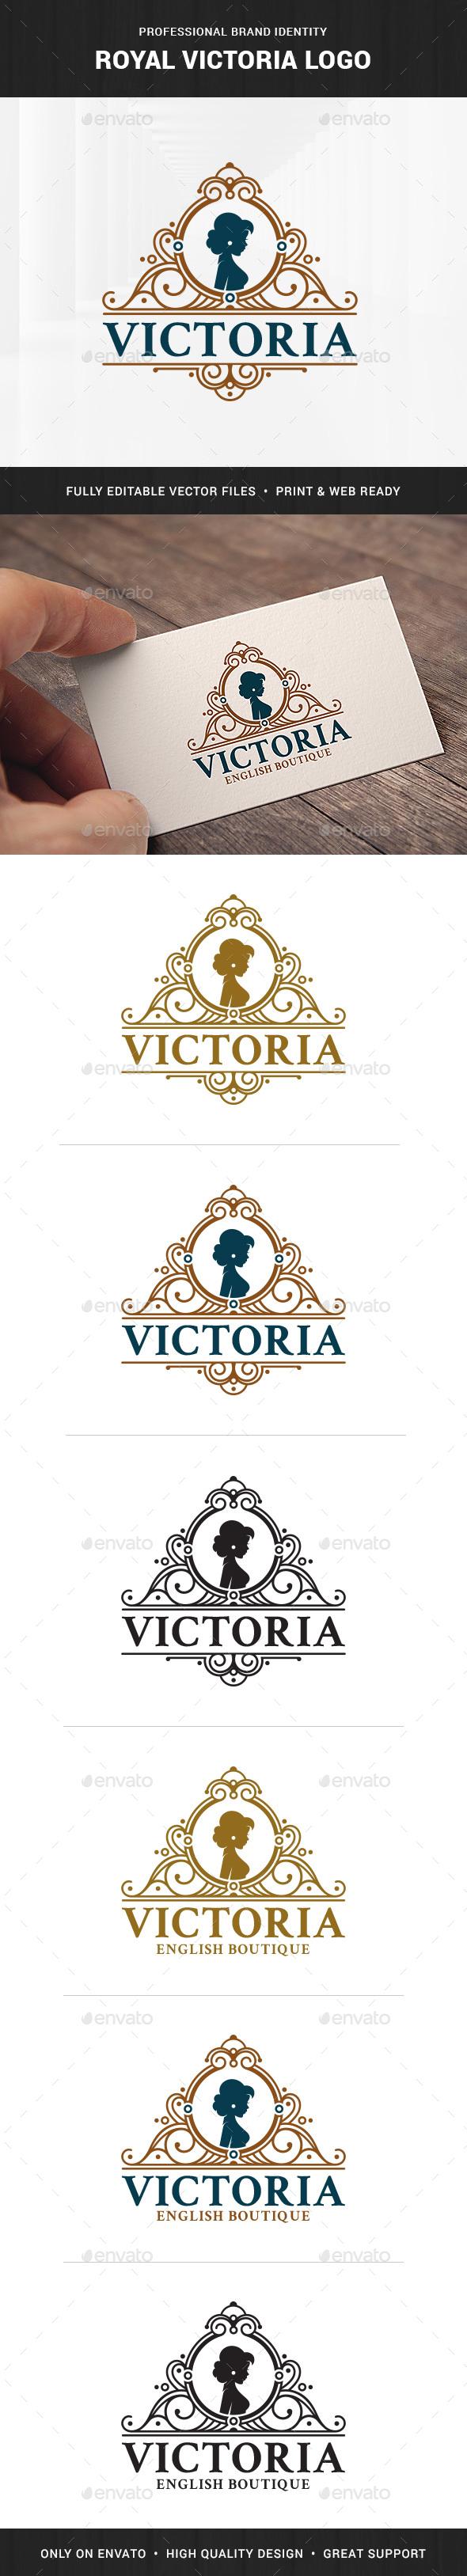 Royal Victoria Logo Template - Crests Logo Templates